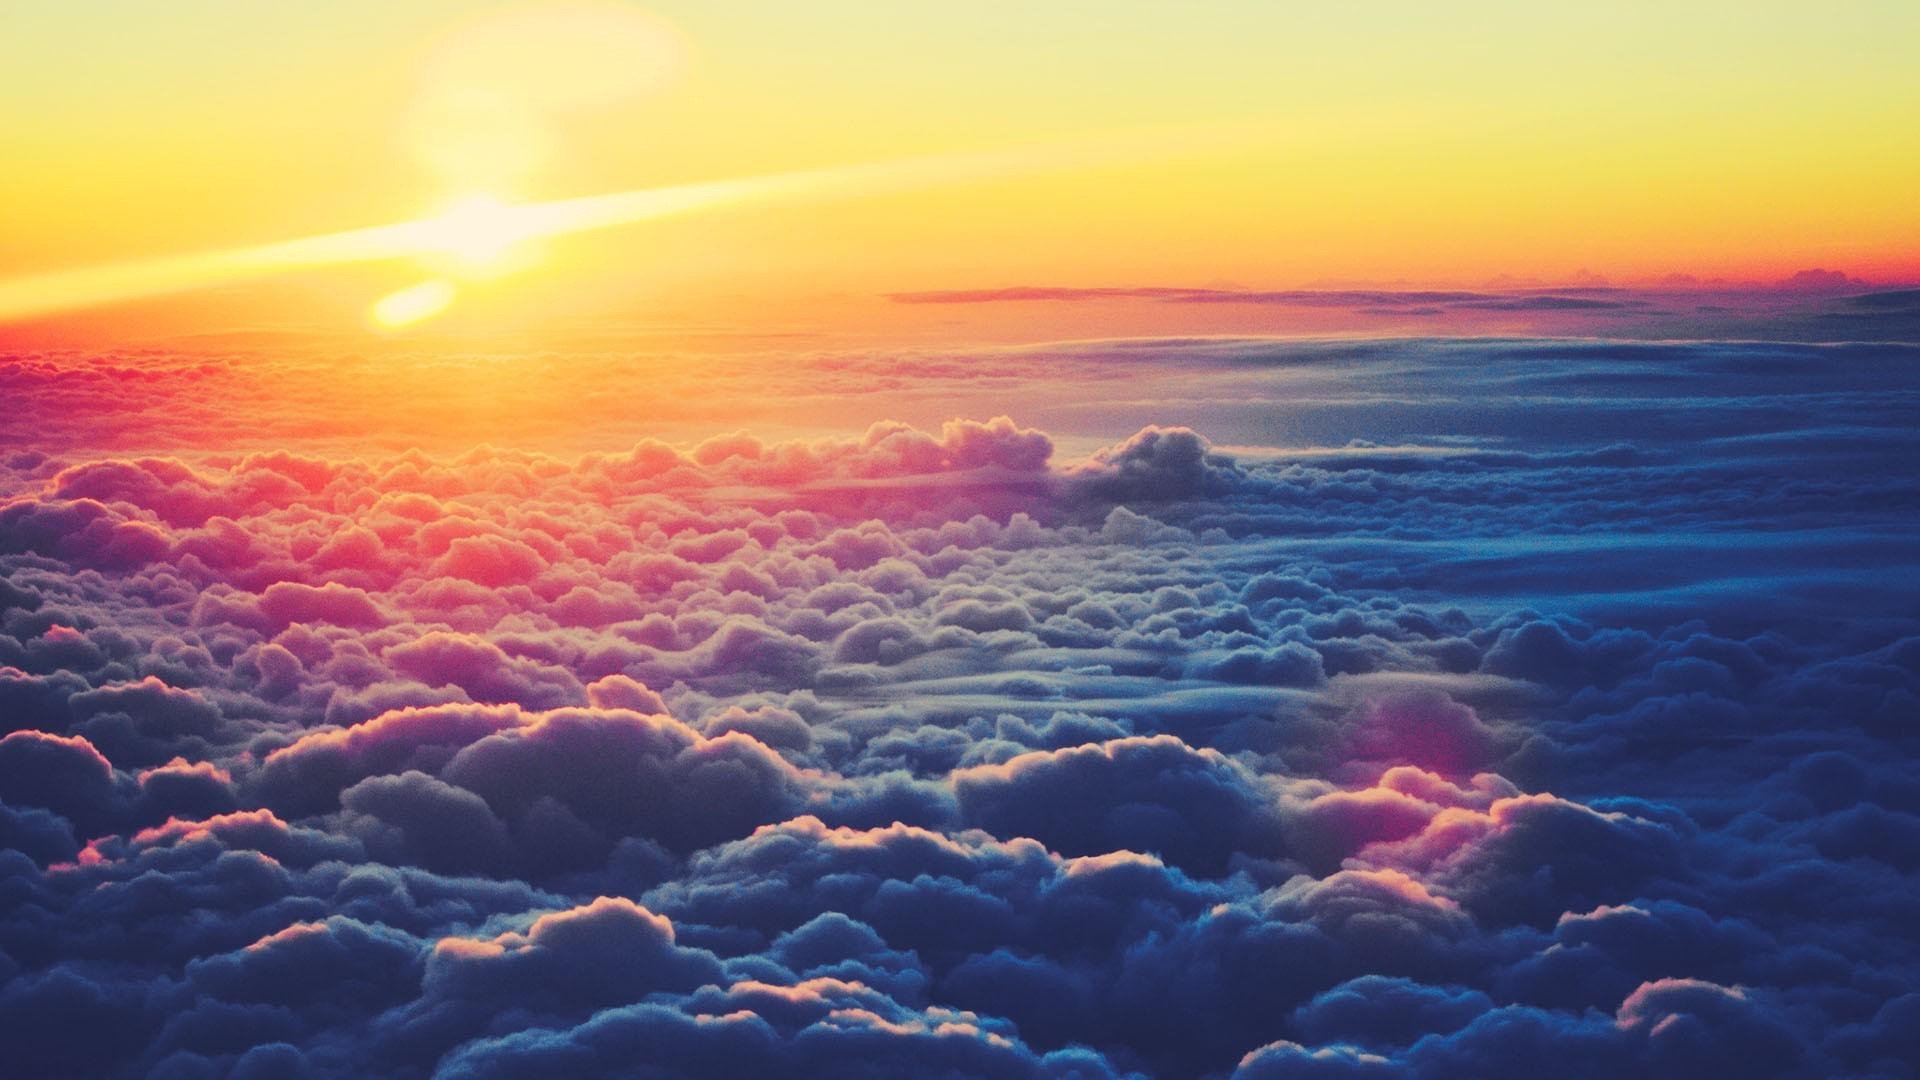 wallpaper : 1920x1080 px, clouds, nature, sky, sunlight, sunrise